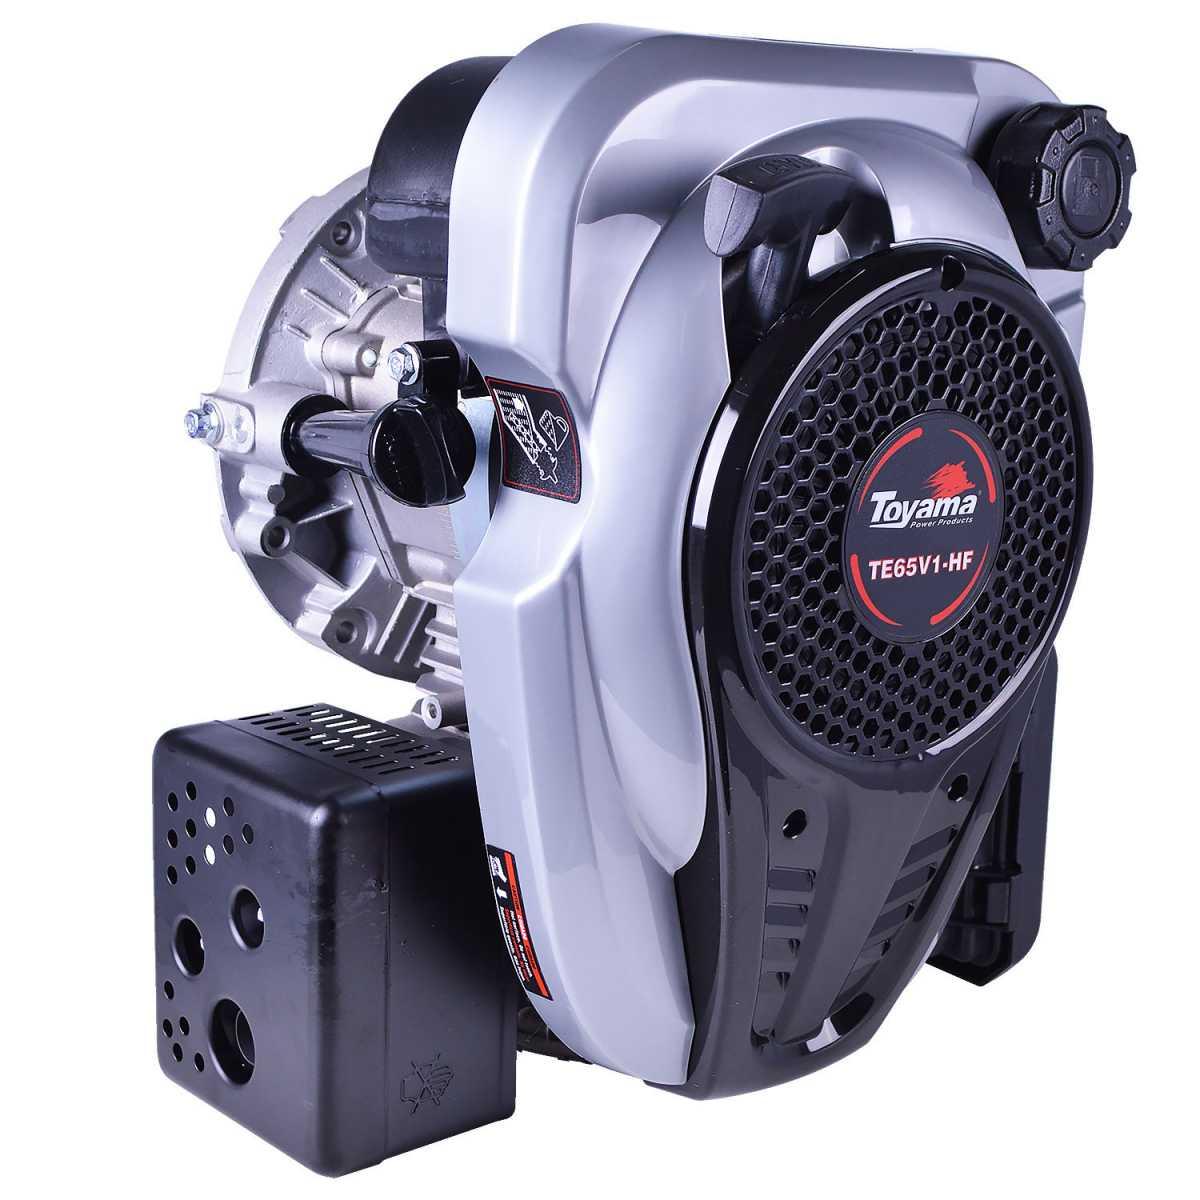 Motor Gasolina 6,5Hp 4T para Rabeta Vertical Te65V1Hf Toyama